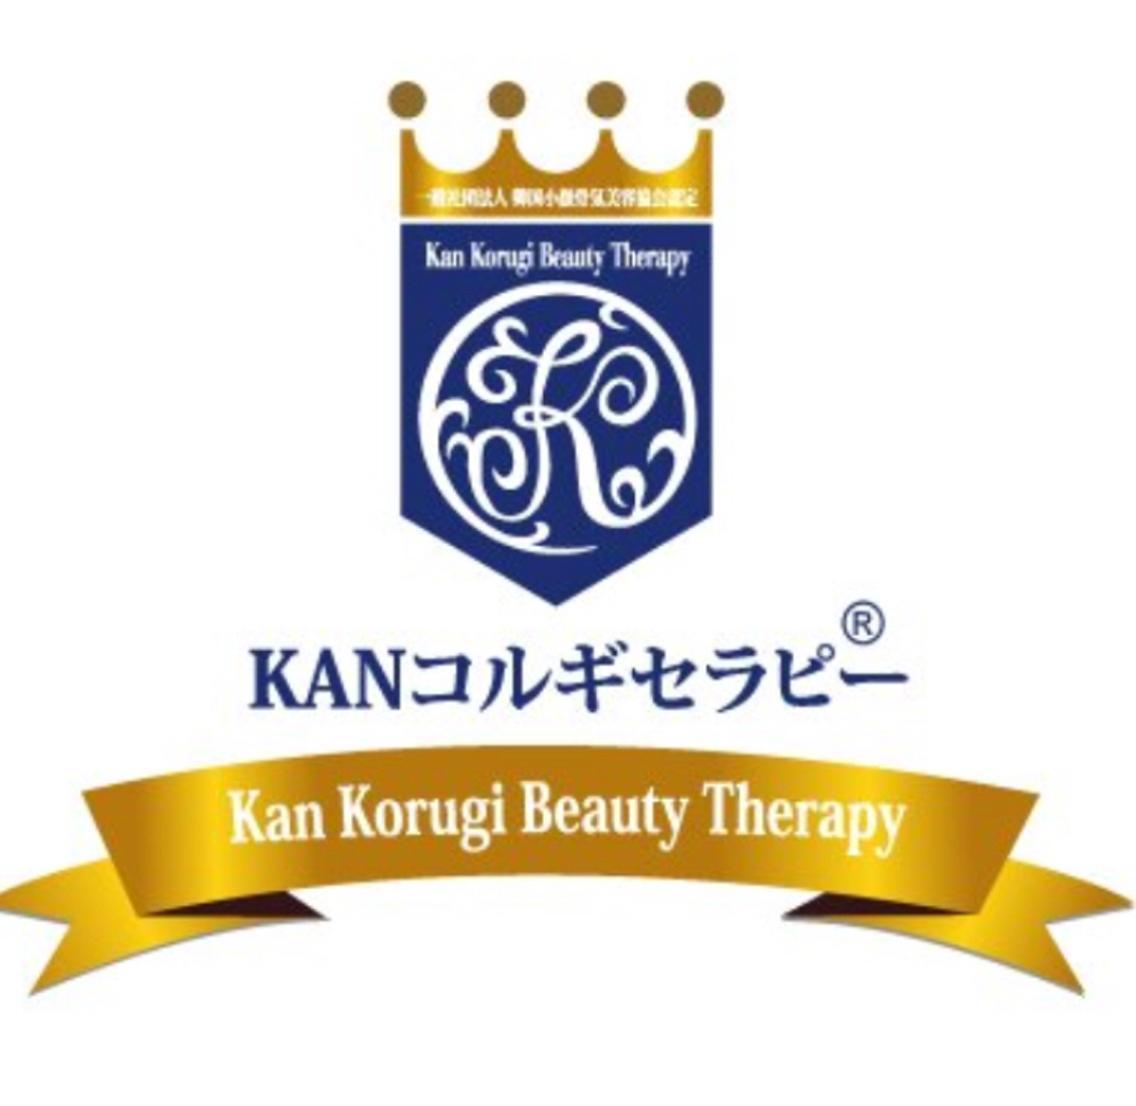 KANコルギセラピー錦糸町店所属・小林雲娇の掲載